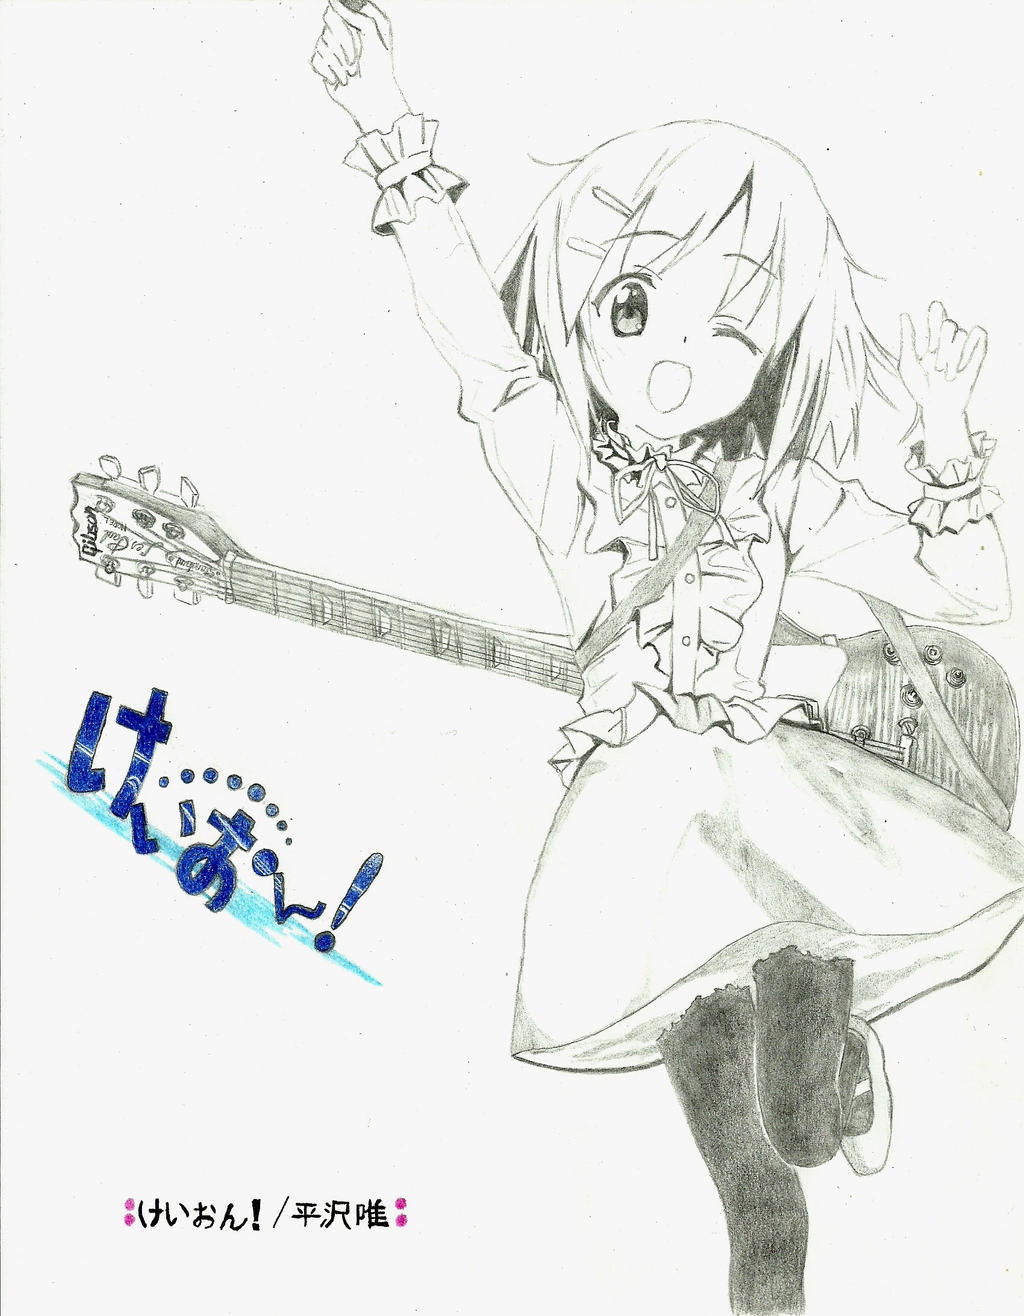 Yui x Guitah Festival version. by madaraLUNA